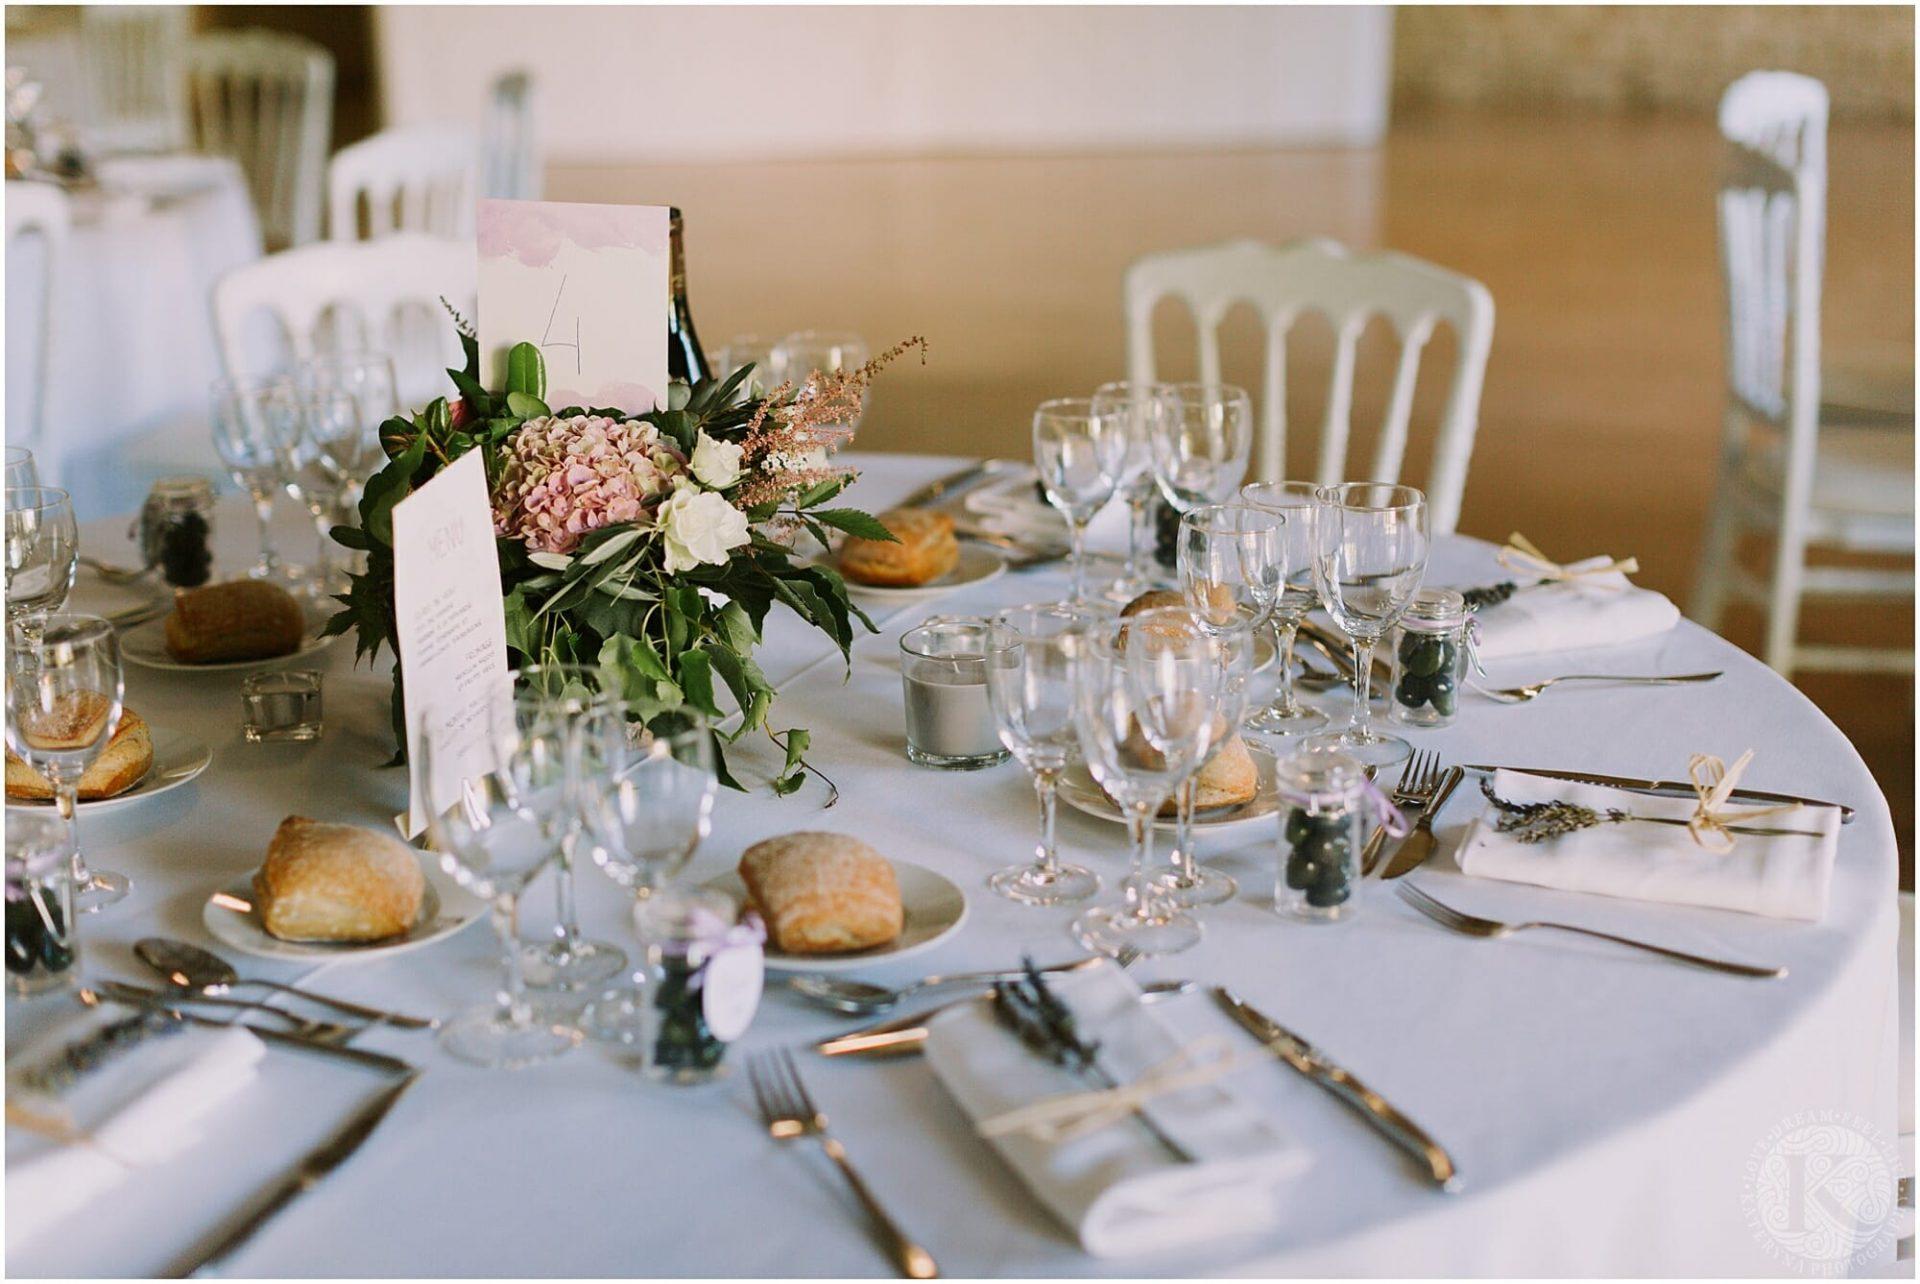 Kateryna-photos-photographe-mariage-chateau-des-3-fontaines-provence-avignon-vaucluse-sud_0111.jpg